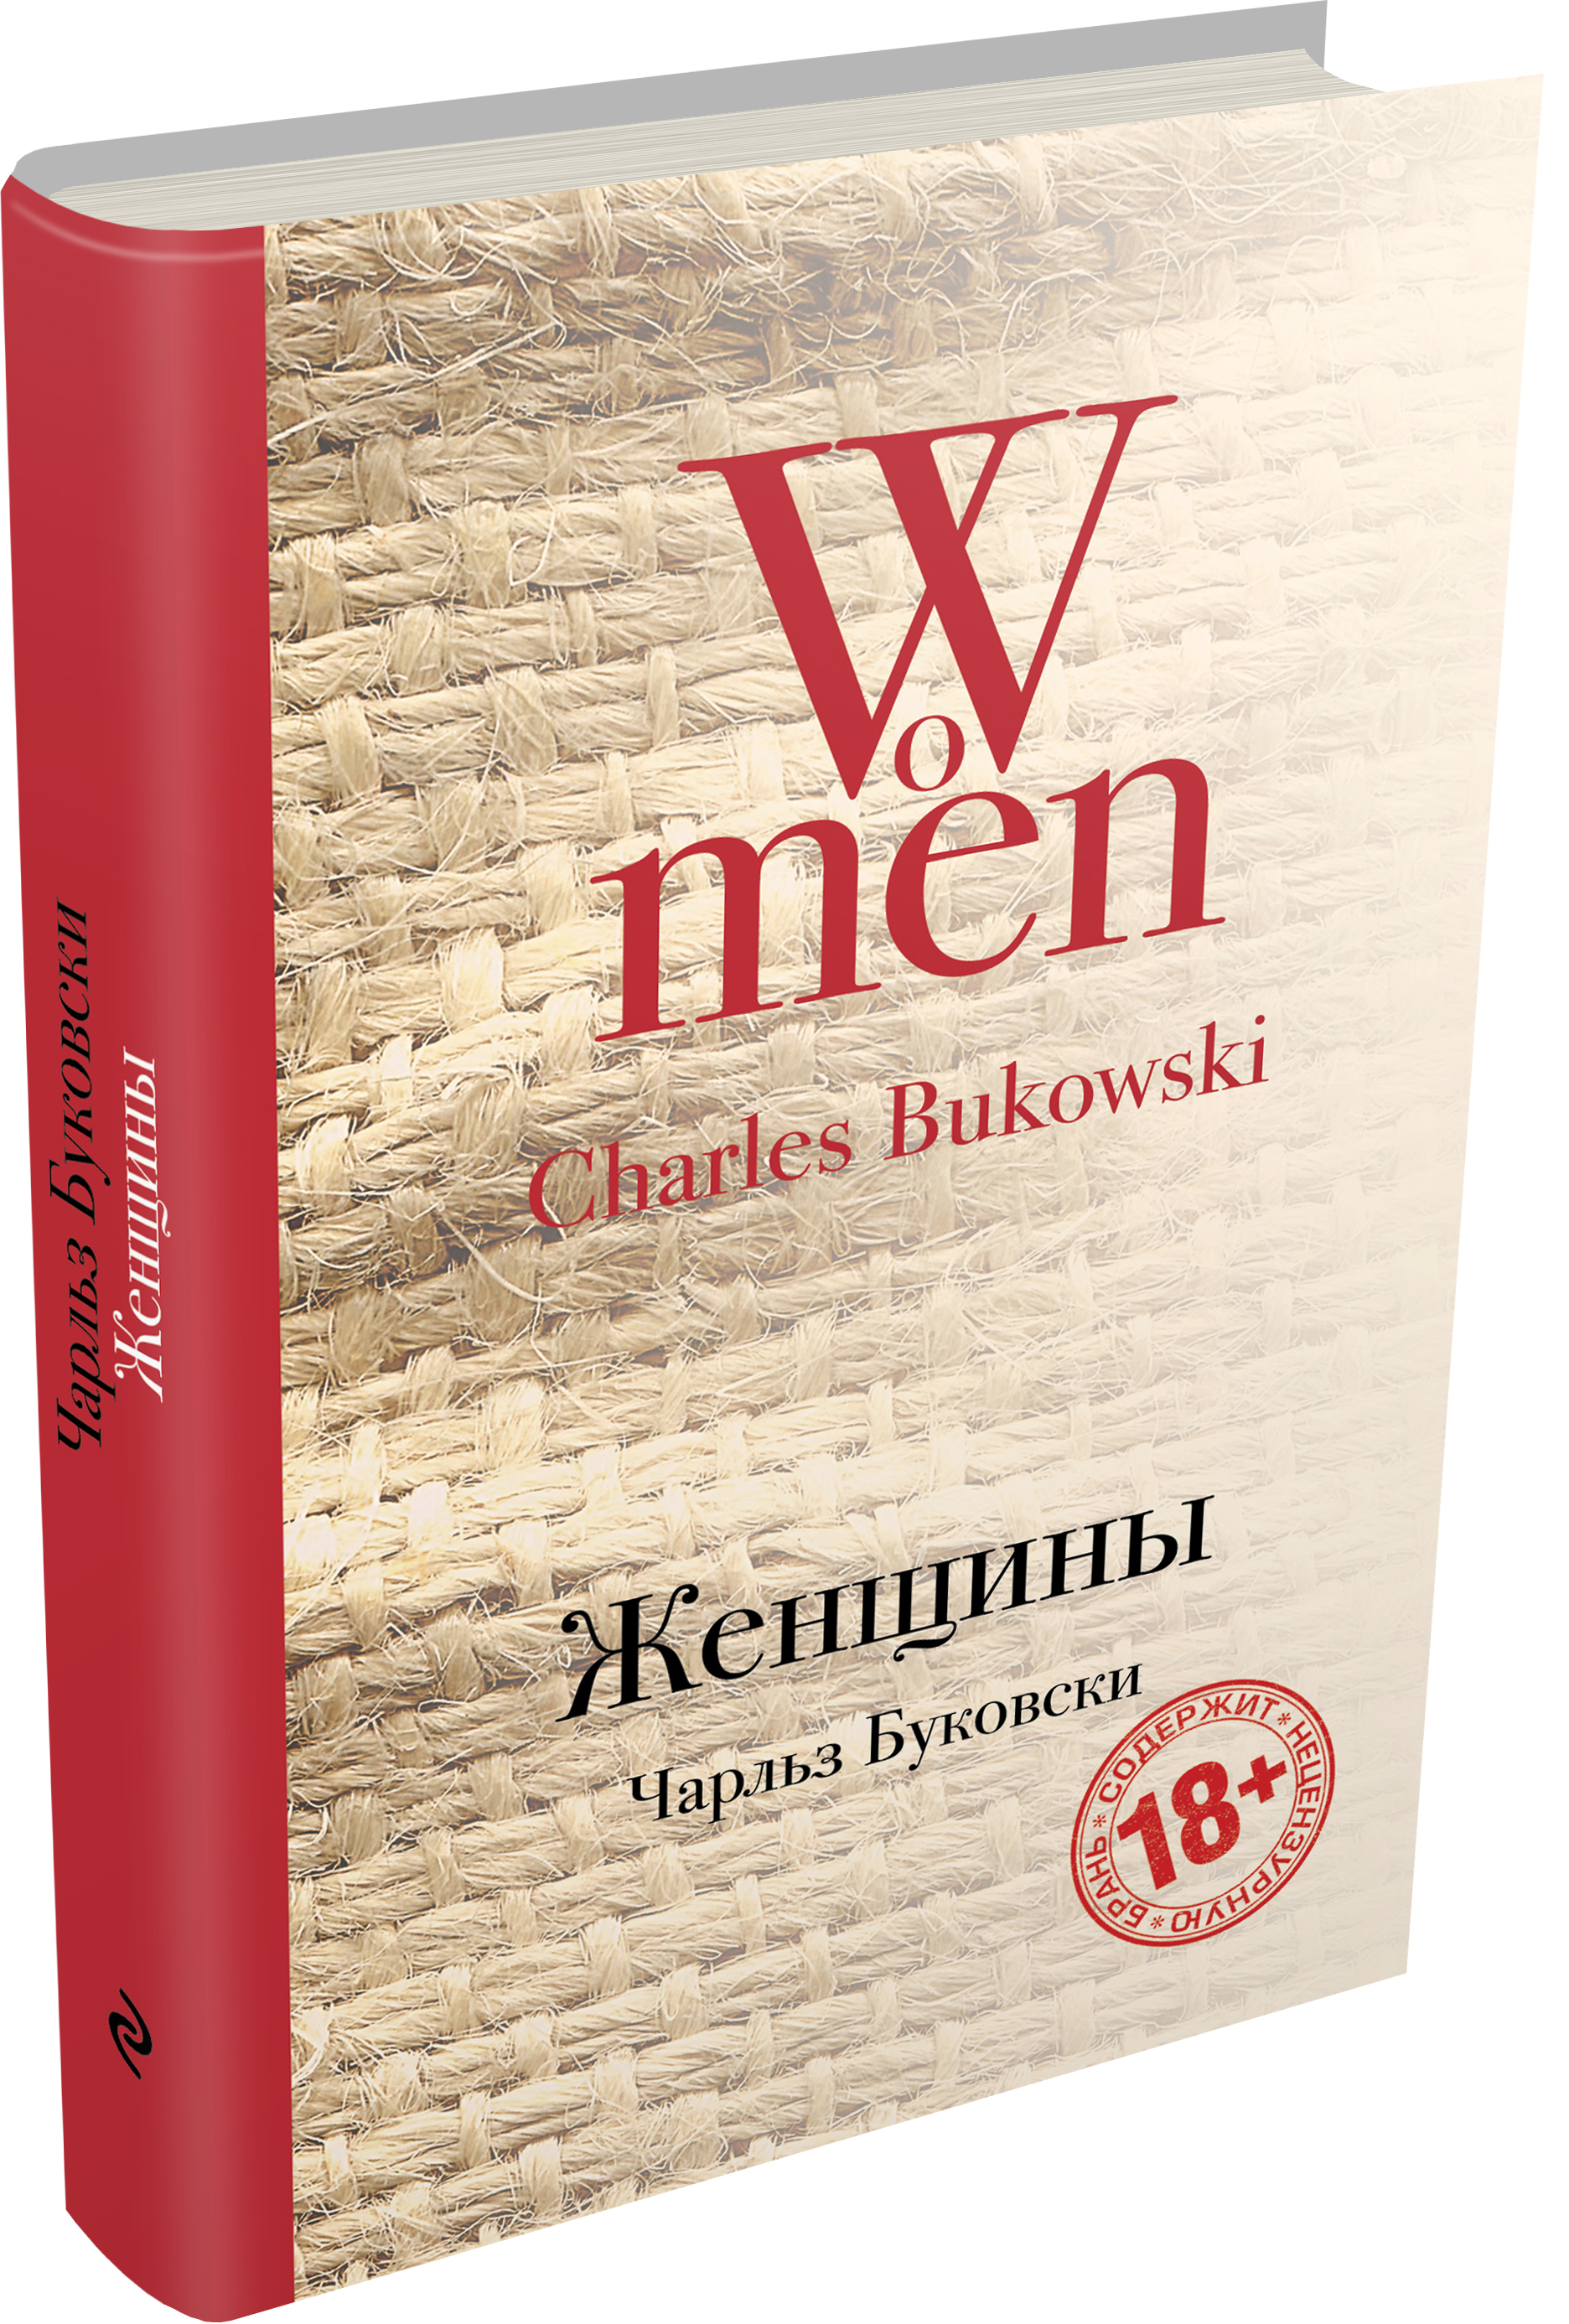 Буковски Ч. Женщины футболка стрэйч printio чарльз буковски charles bukowski